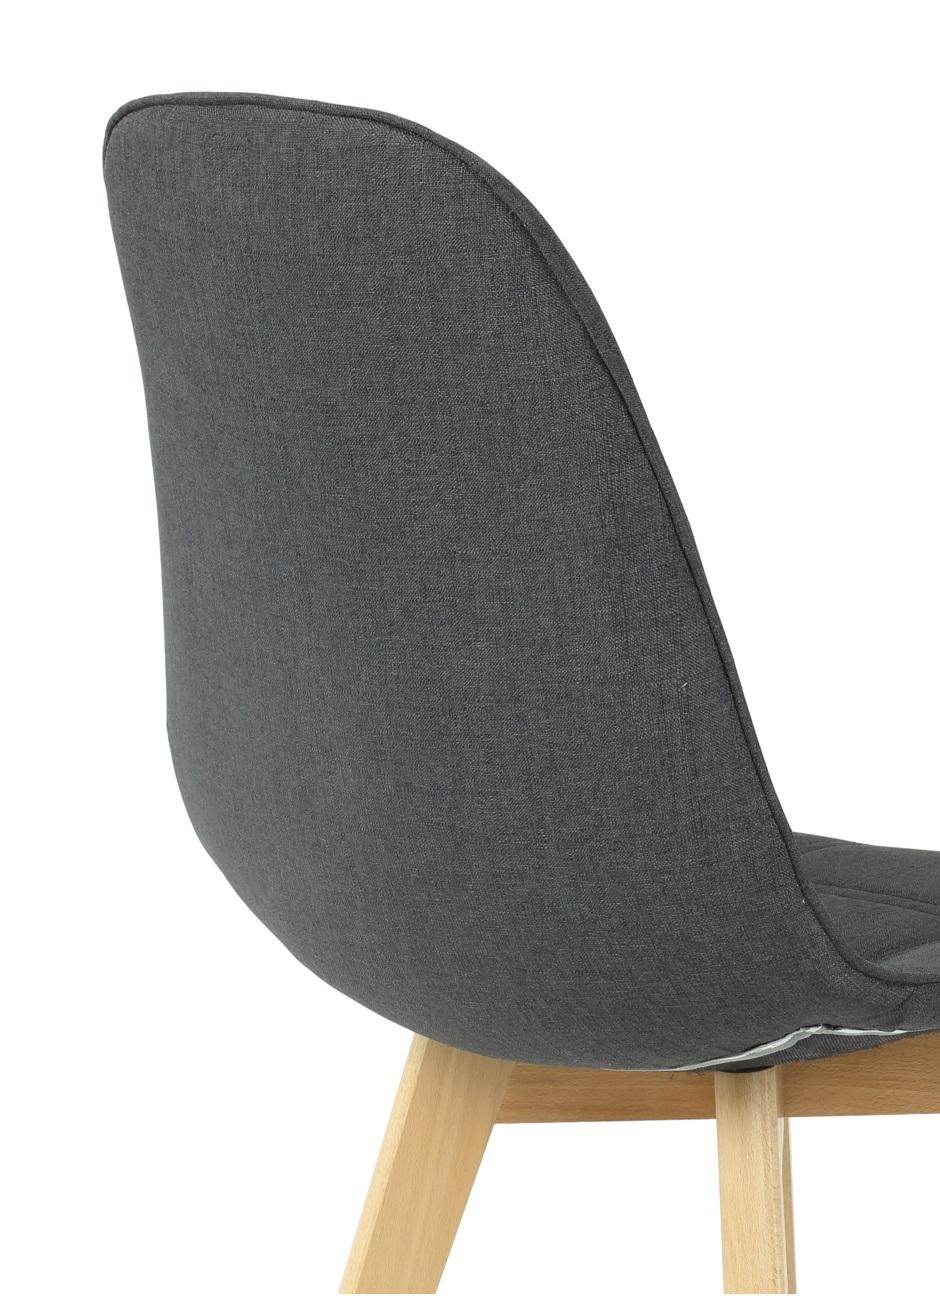 2 Stühle=Set Vierfussstuhl Stuhl GinaI28/06 Buche Anthrazit